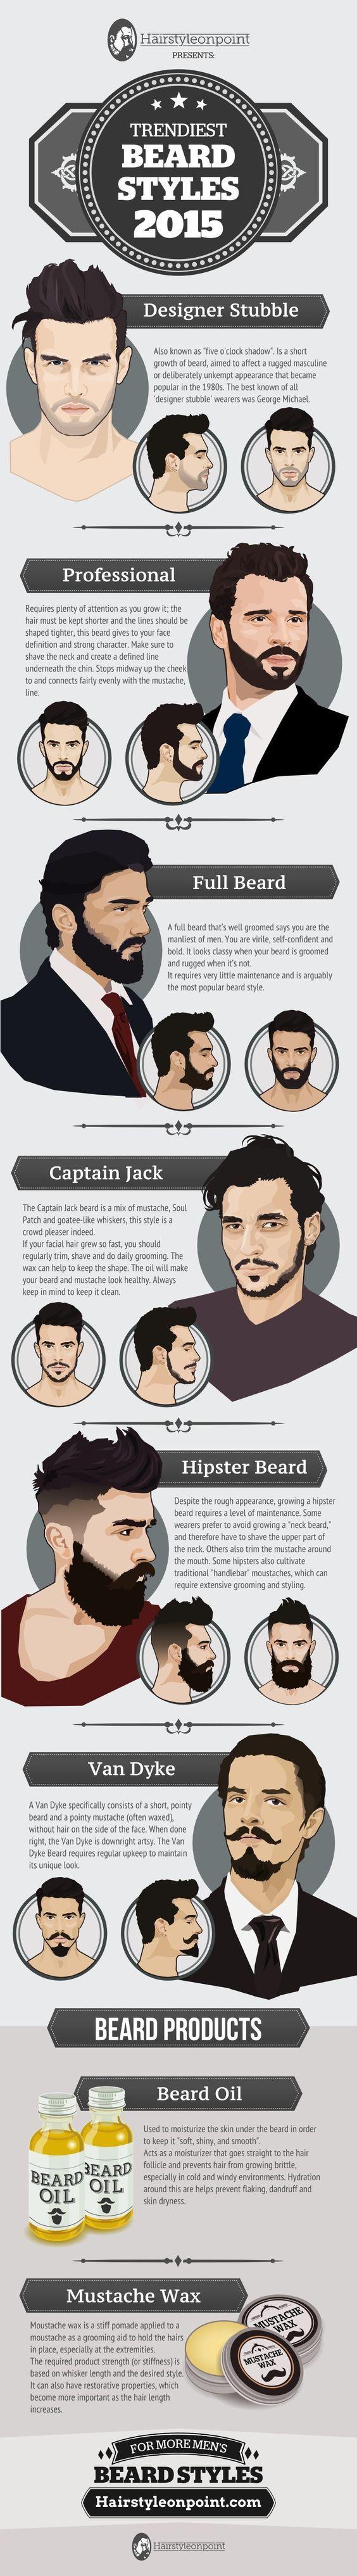 These are the trendiest menus beard styles beards inspiration